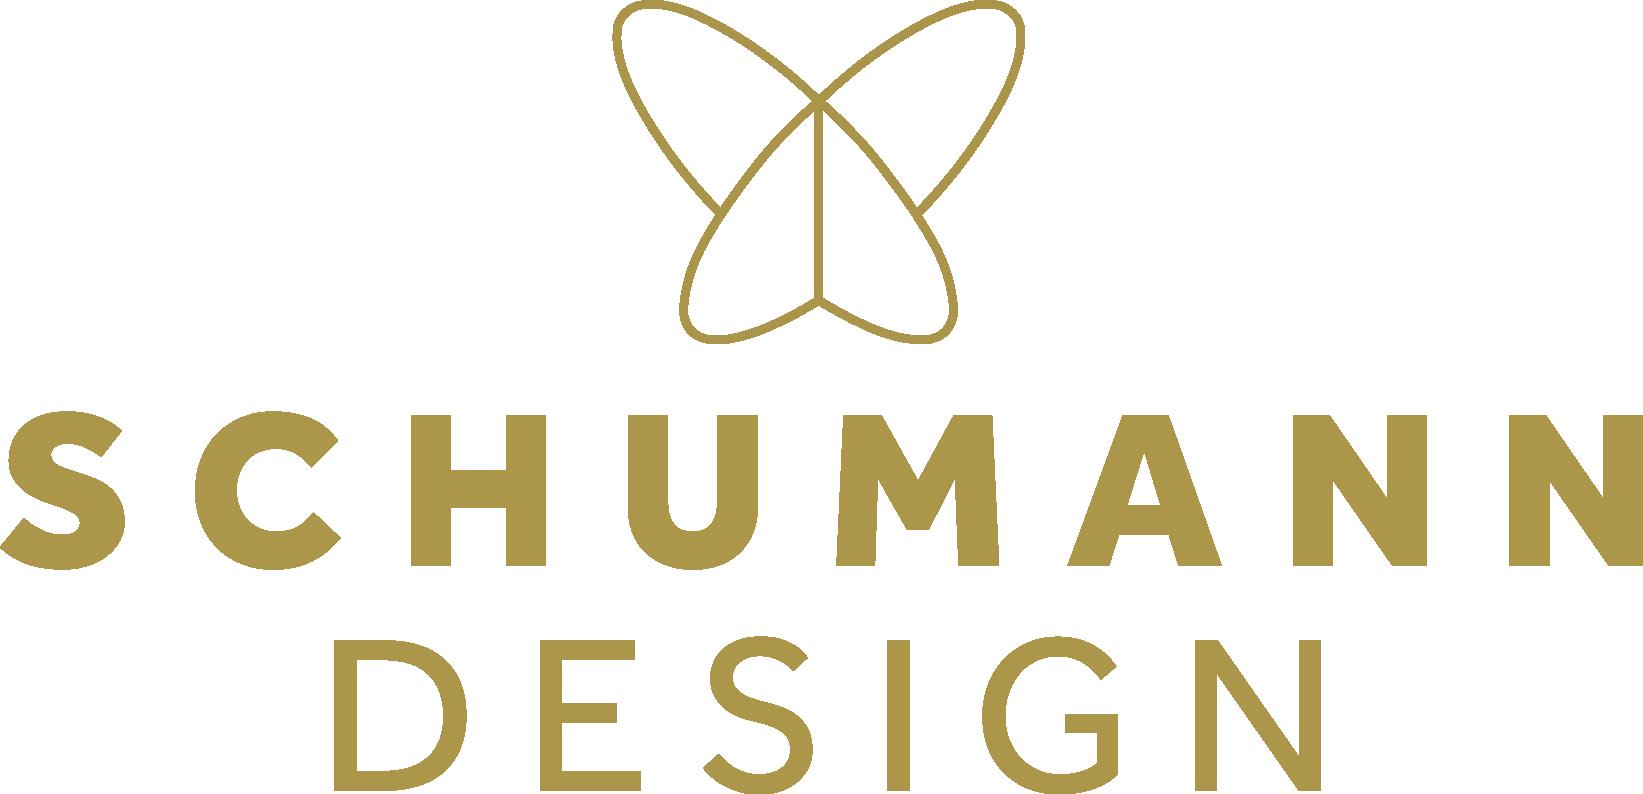 Schumann Design